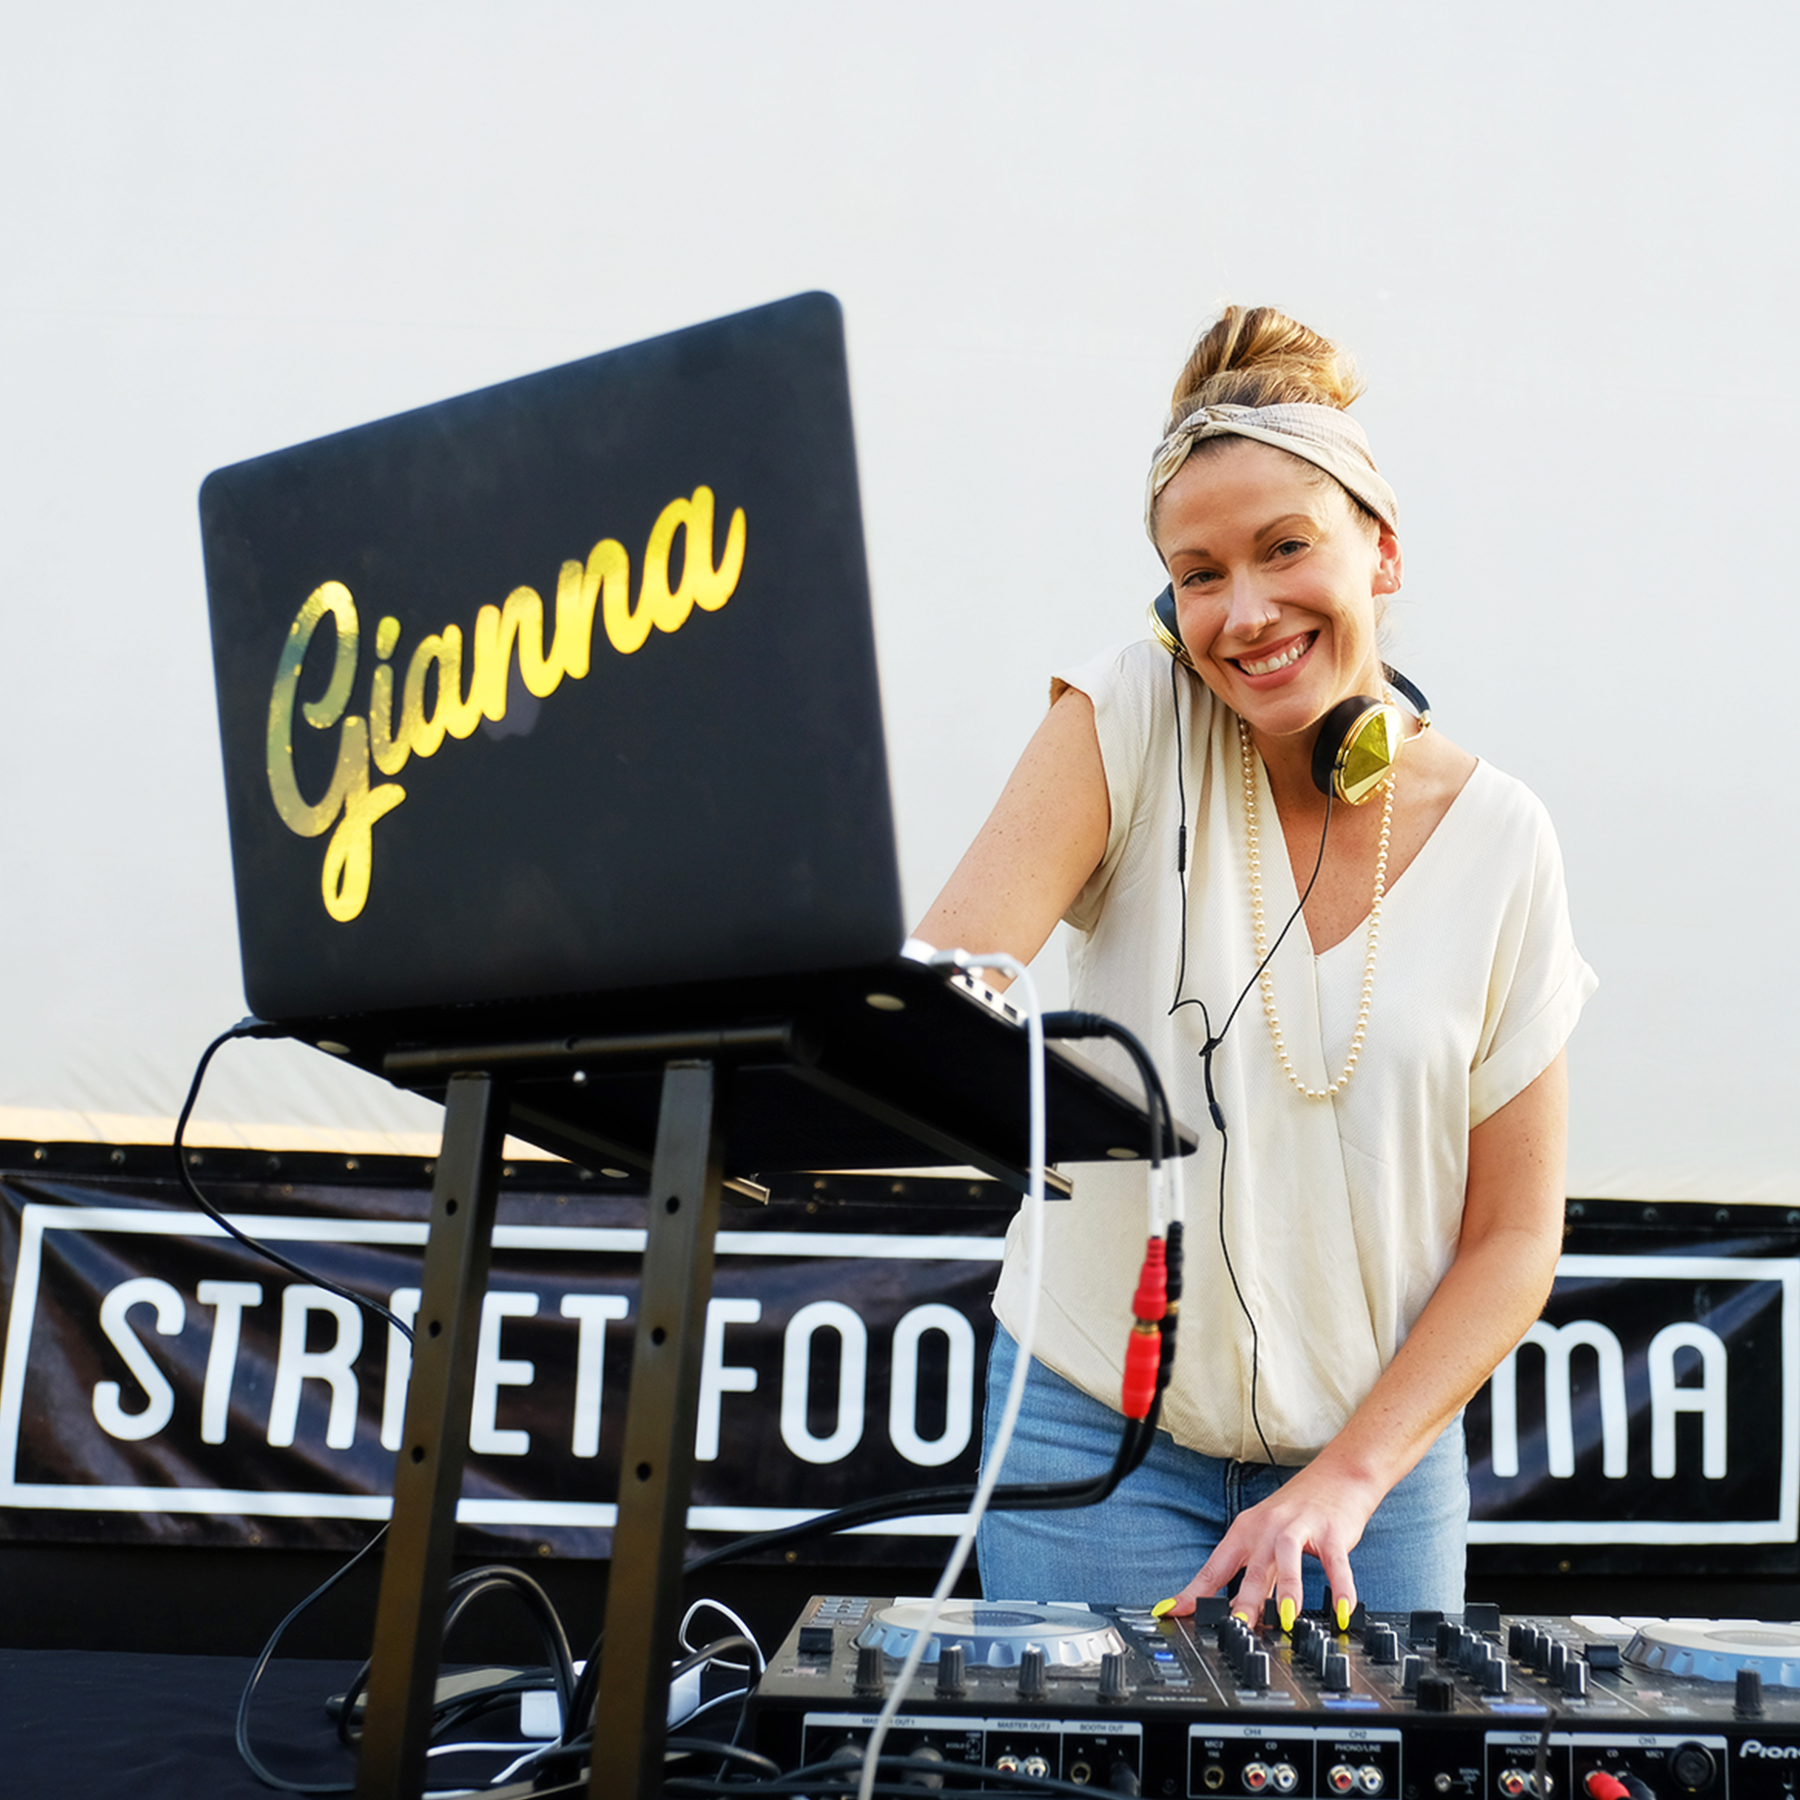 DJ Gianna_Prism DJs_Street Food Cinema.jpg